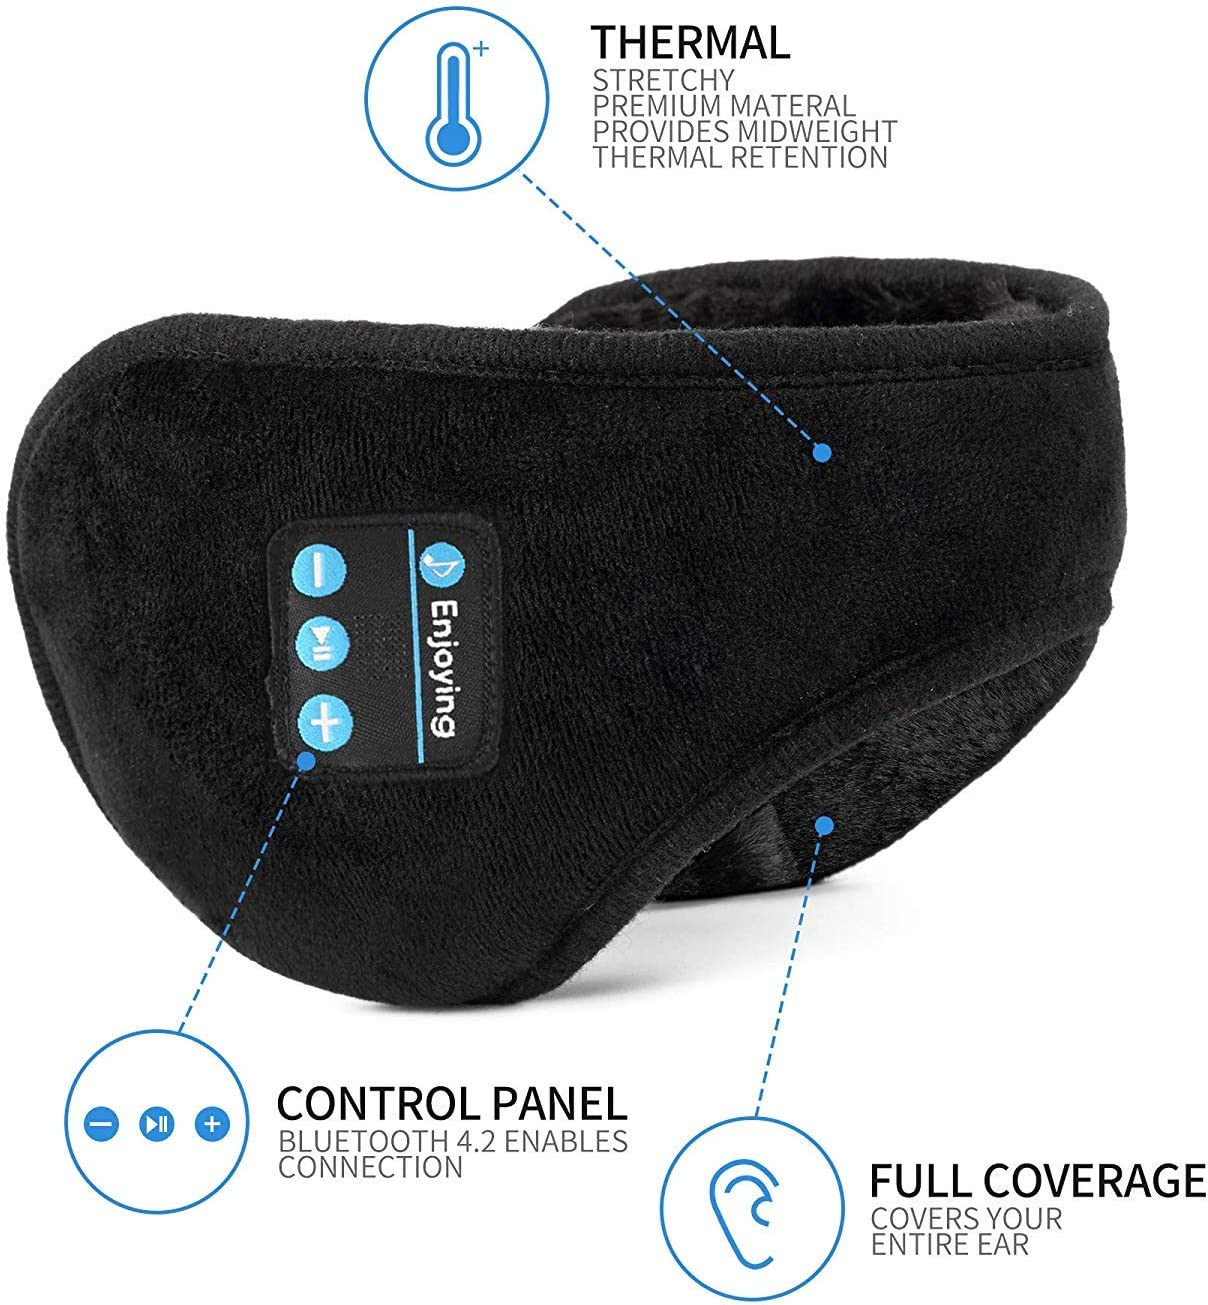 Bluetooth V5.0 Earmuffs Headsets Foldable Soft Unisex Ear Warmer Handsfree Music Ear Muffs Hi-Fi Stereo Wireless Headset Bilt-in Speakers Microphone for Winter Outdoor Lveal Bluetooth Earmuffs Headphones Ear Warmers Black